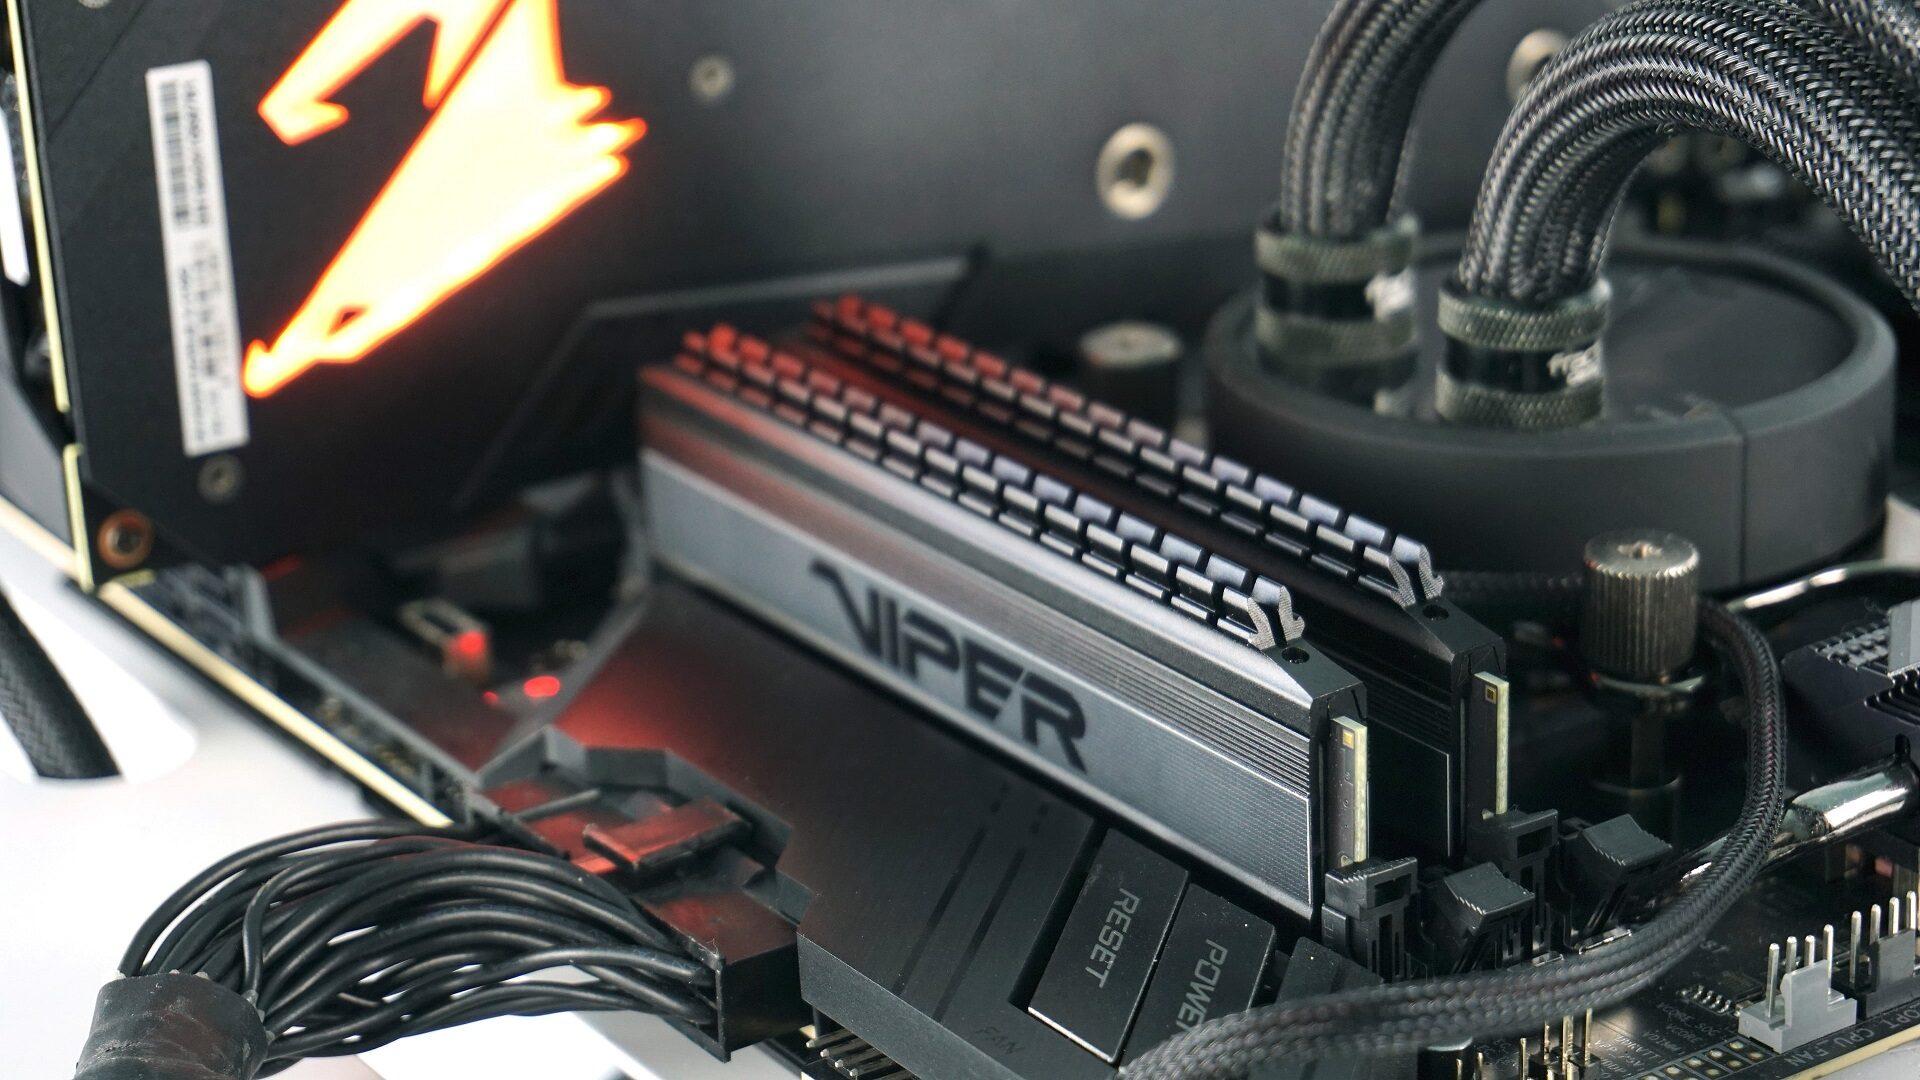 Viper 4 RAM